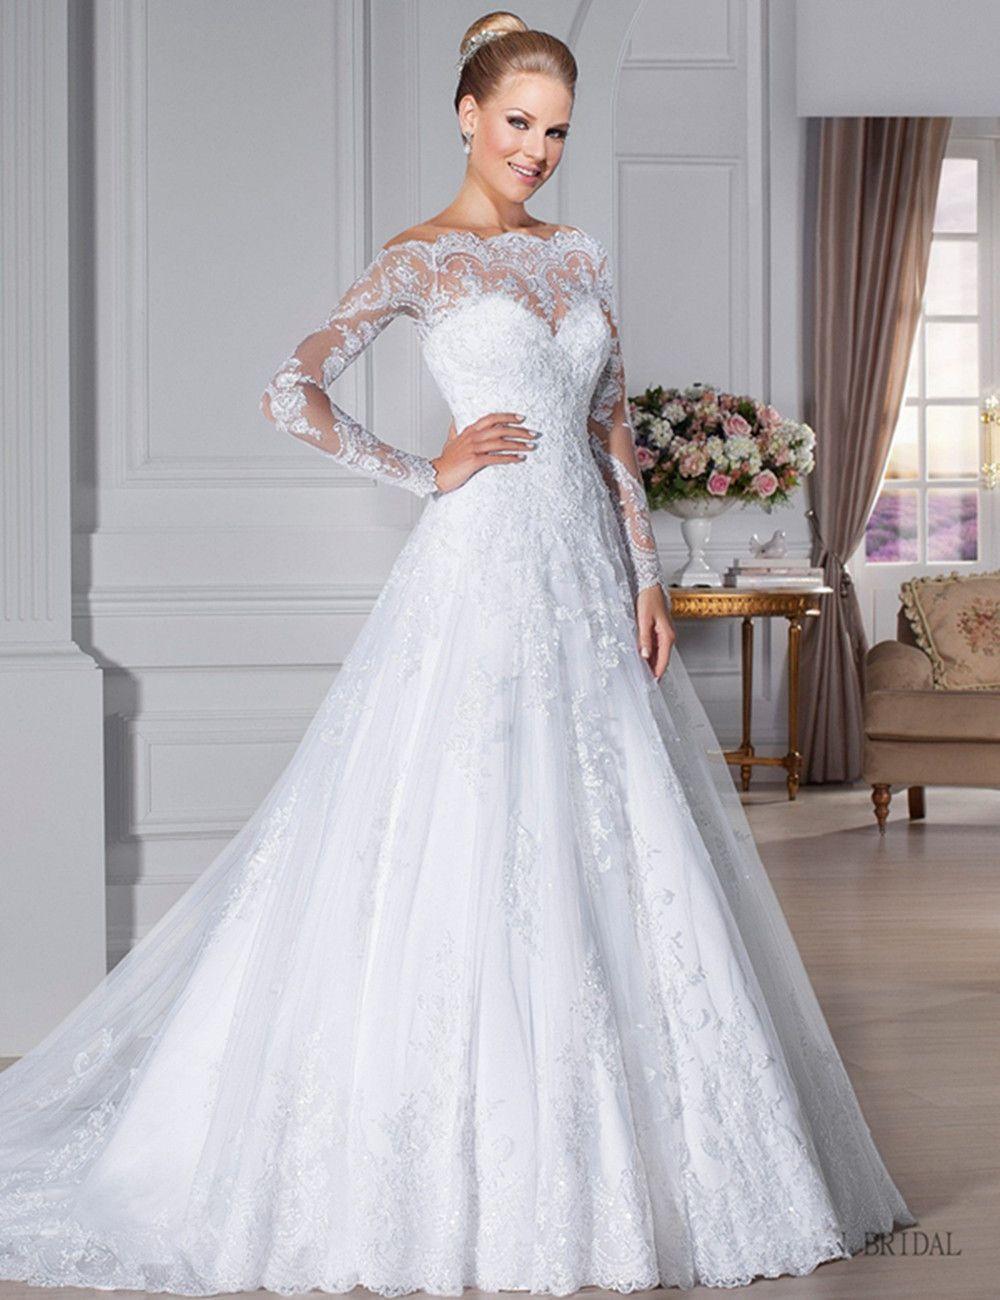 Vestido de noiva wedding dress custom made scoop see through back